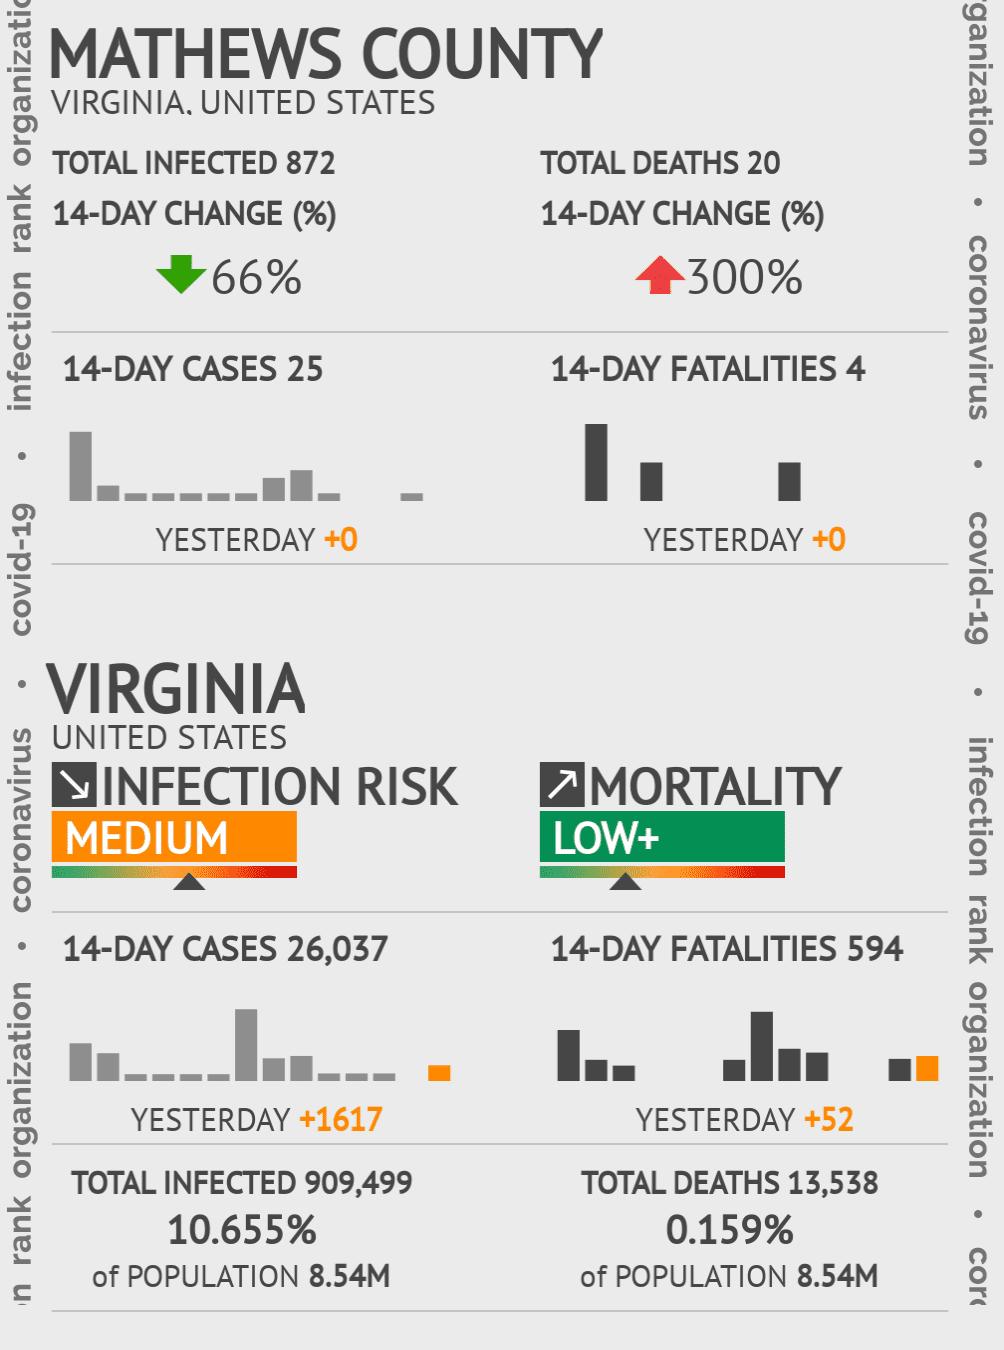 Mathews County Coronavirus Covid-19 Risk of Infection on July 24, 2021